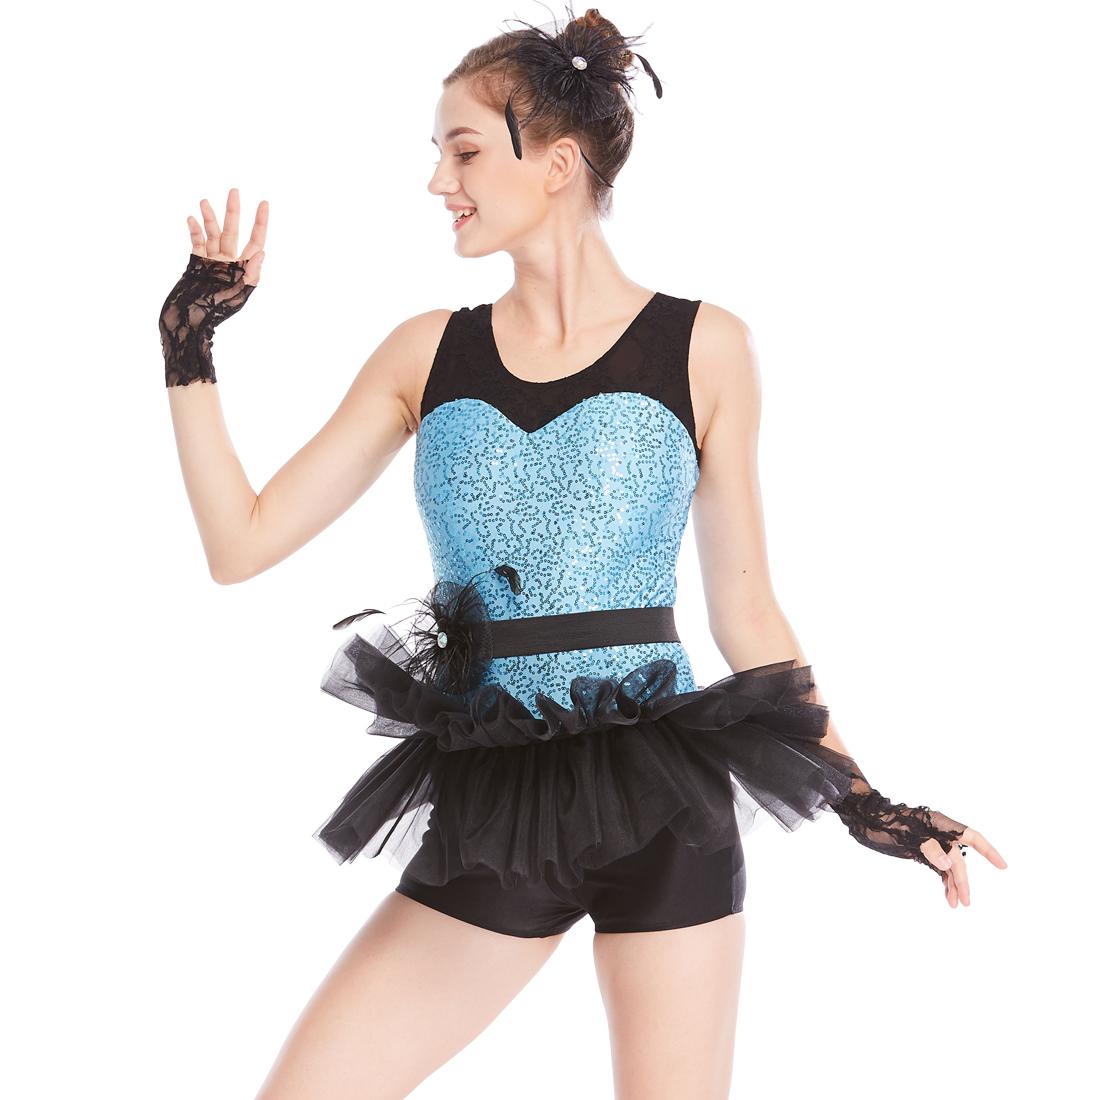 MIDEE durable dance costume get quote events-2